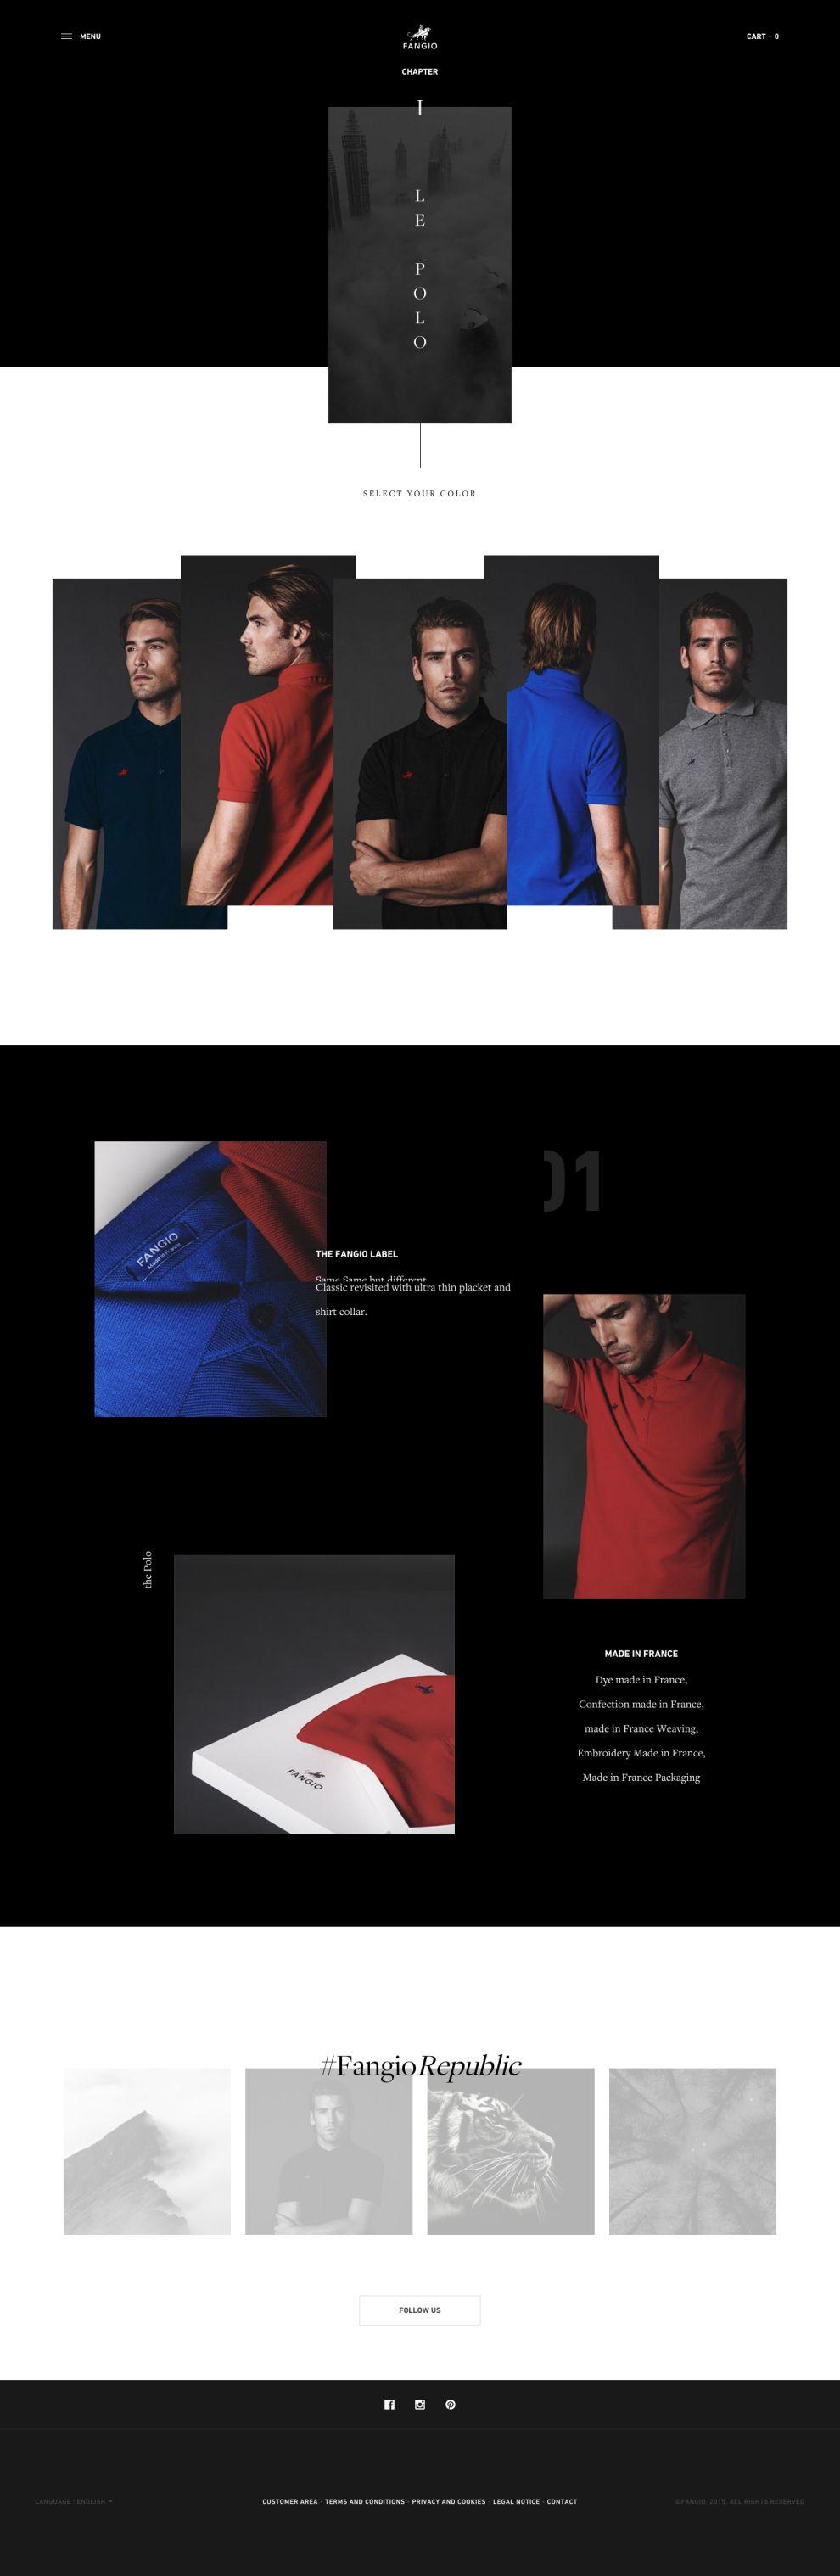 Fangio Elegant Product Page